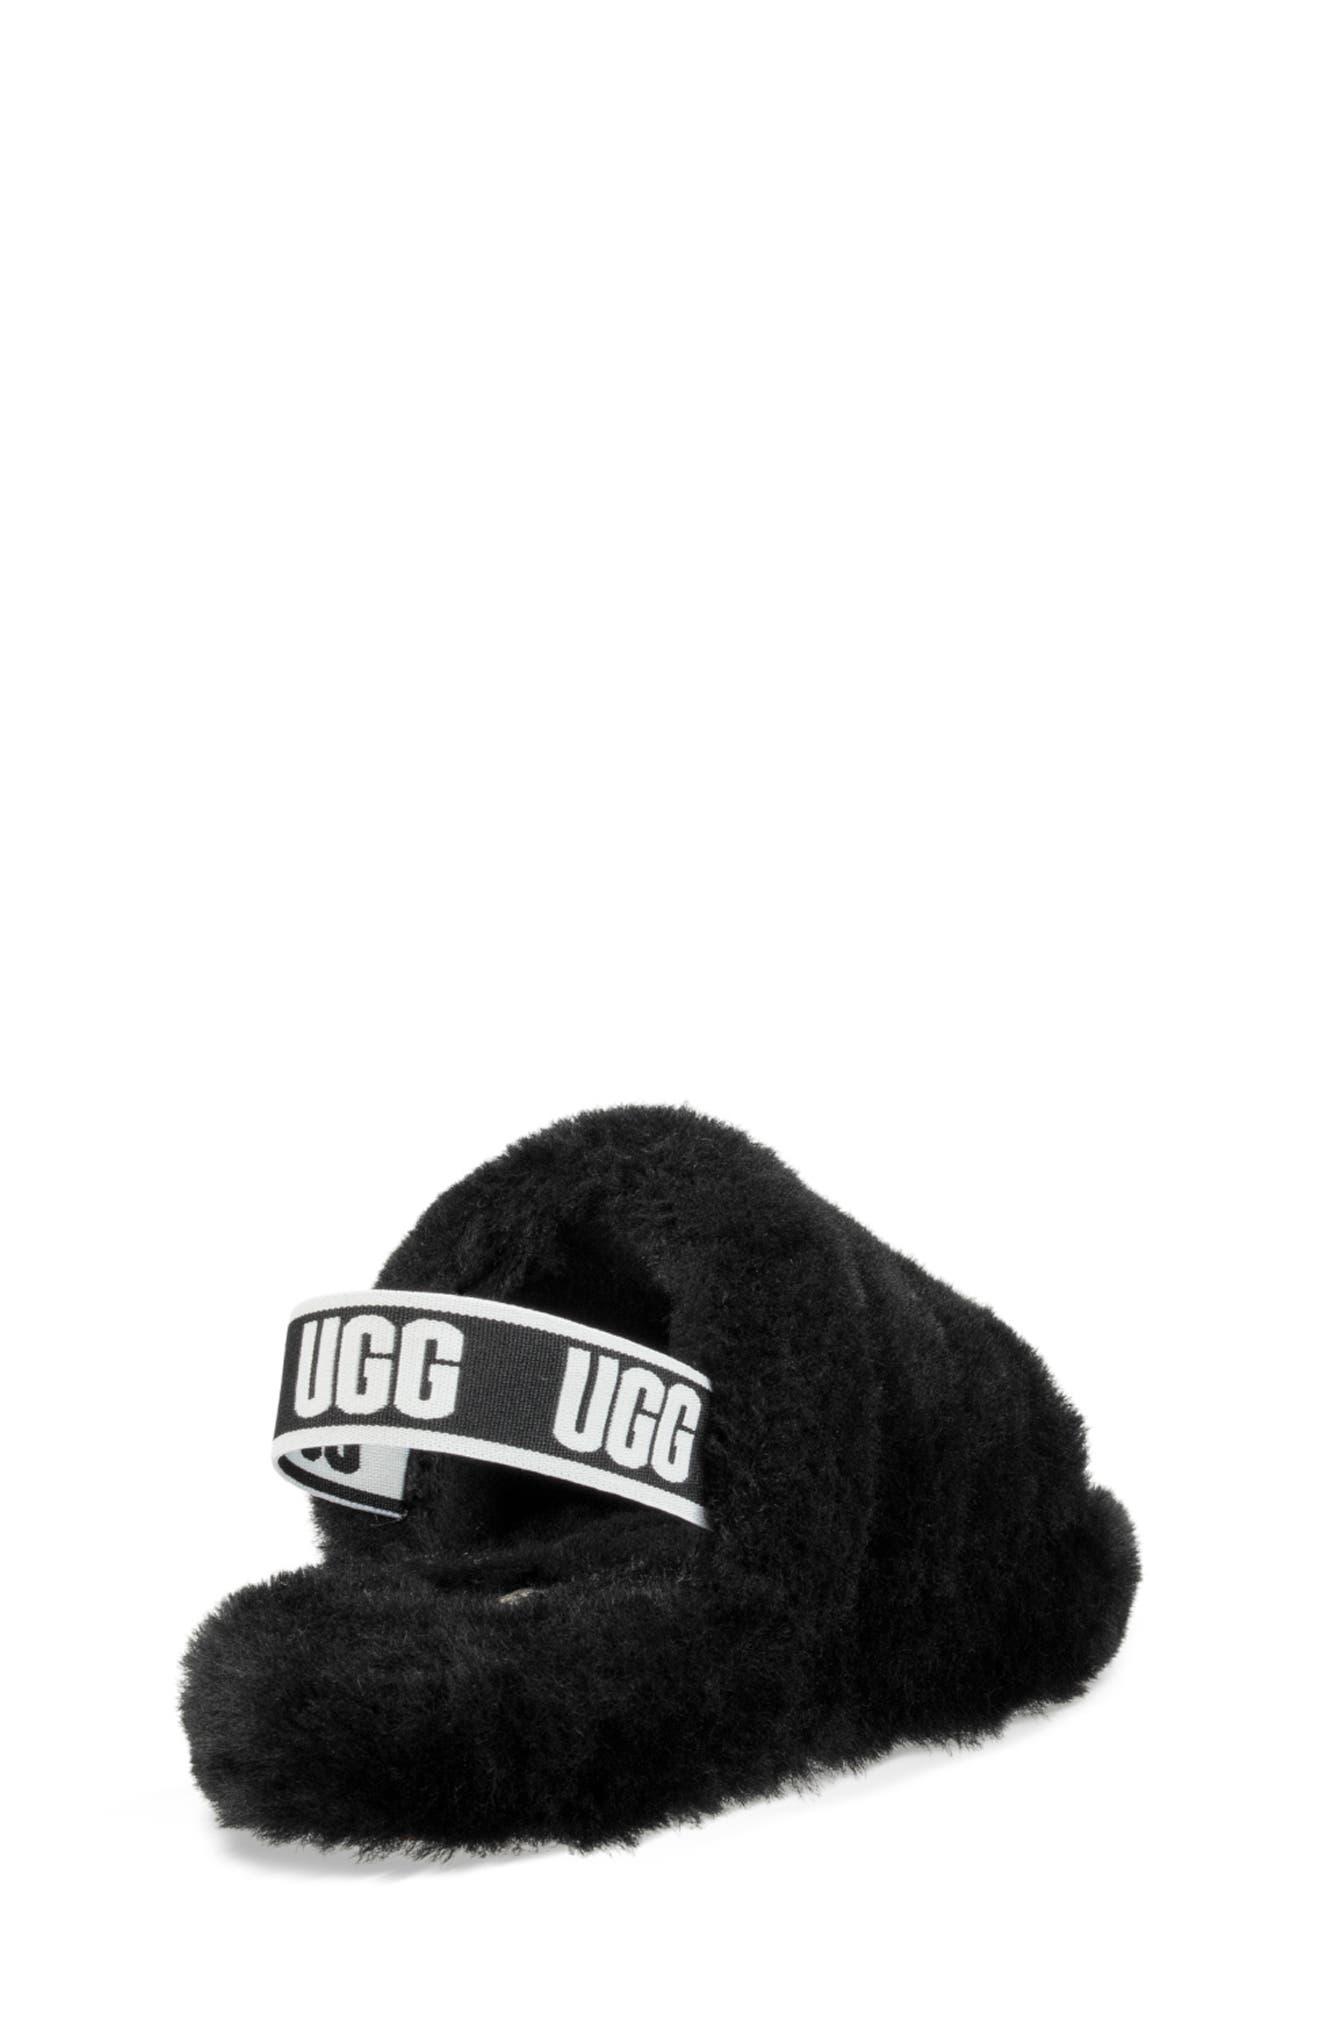 UGG<SUP>®</SUP>, Fluff Yeah Genuine Shearling Slide Sandal, Alternate thumbnail 2, color, BLACK